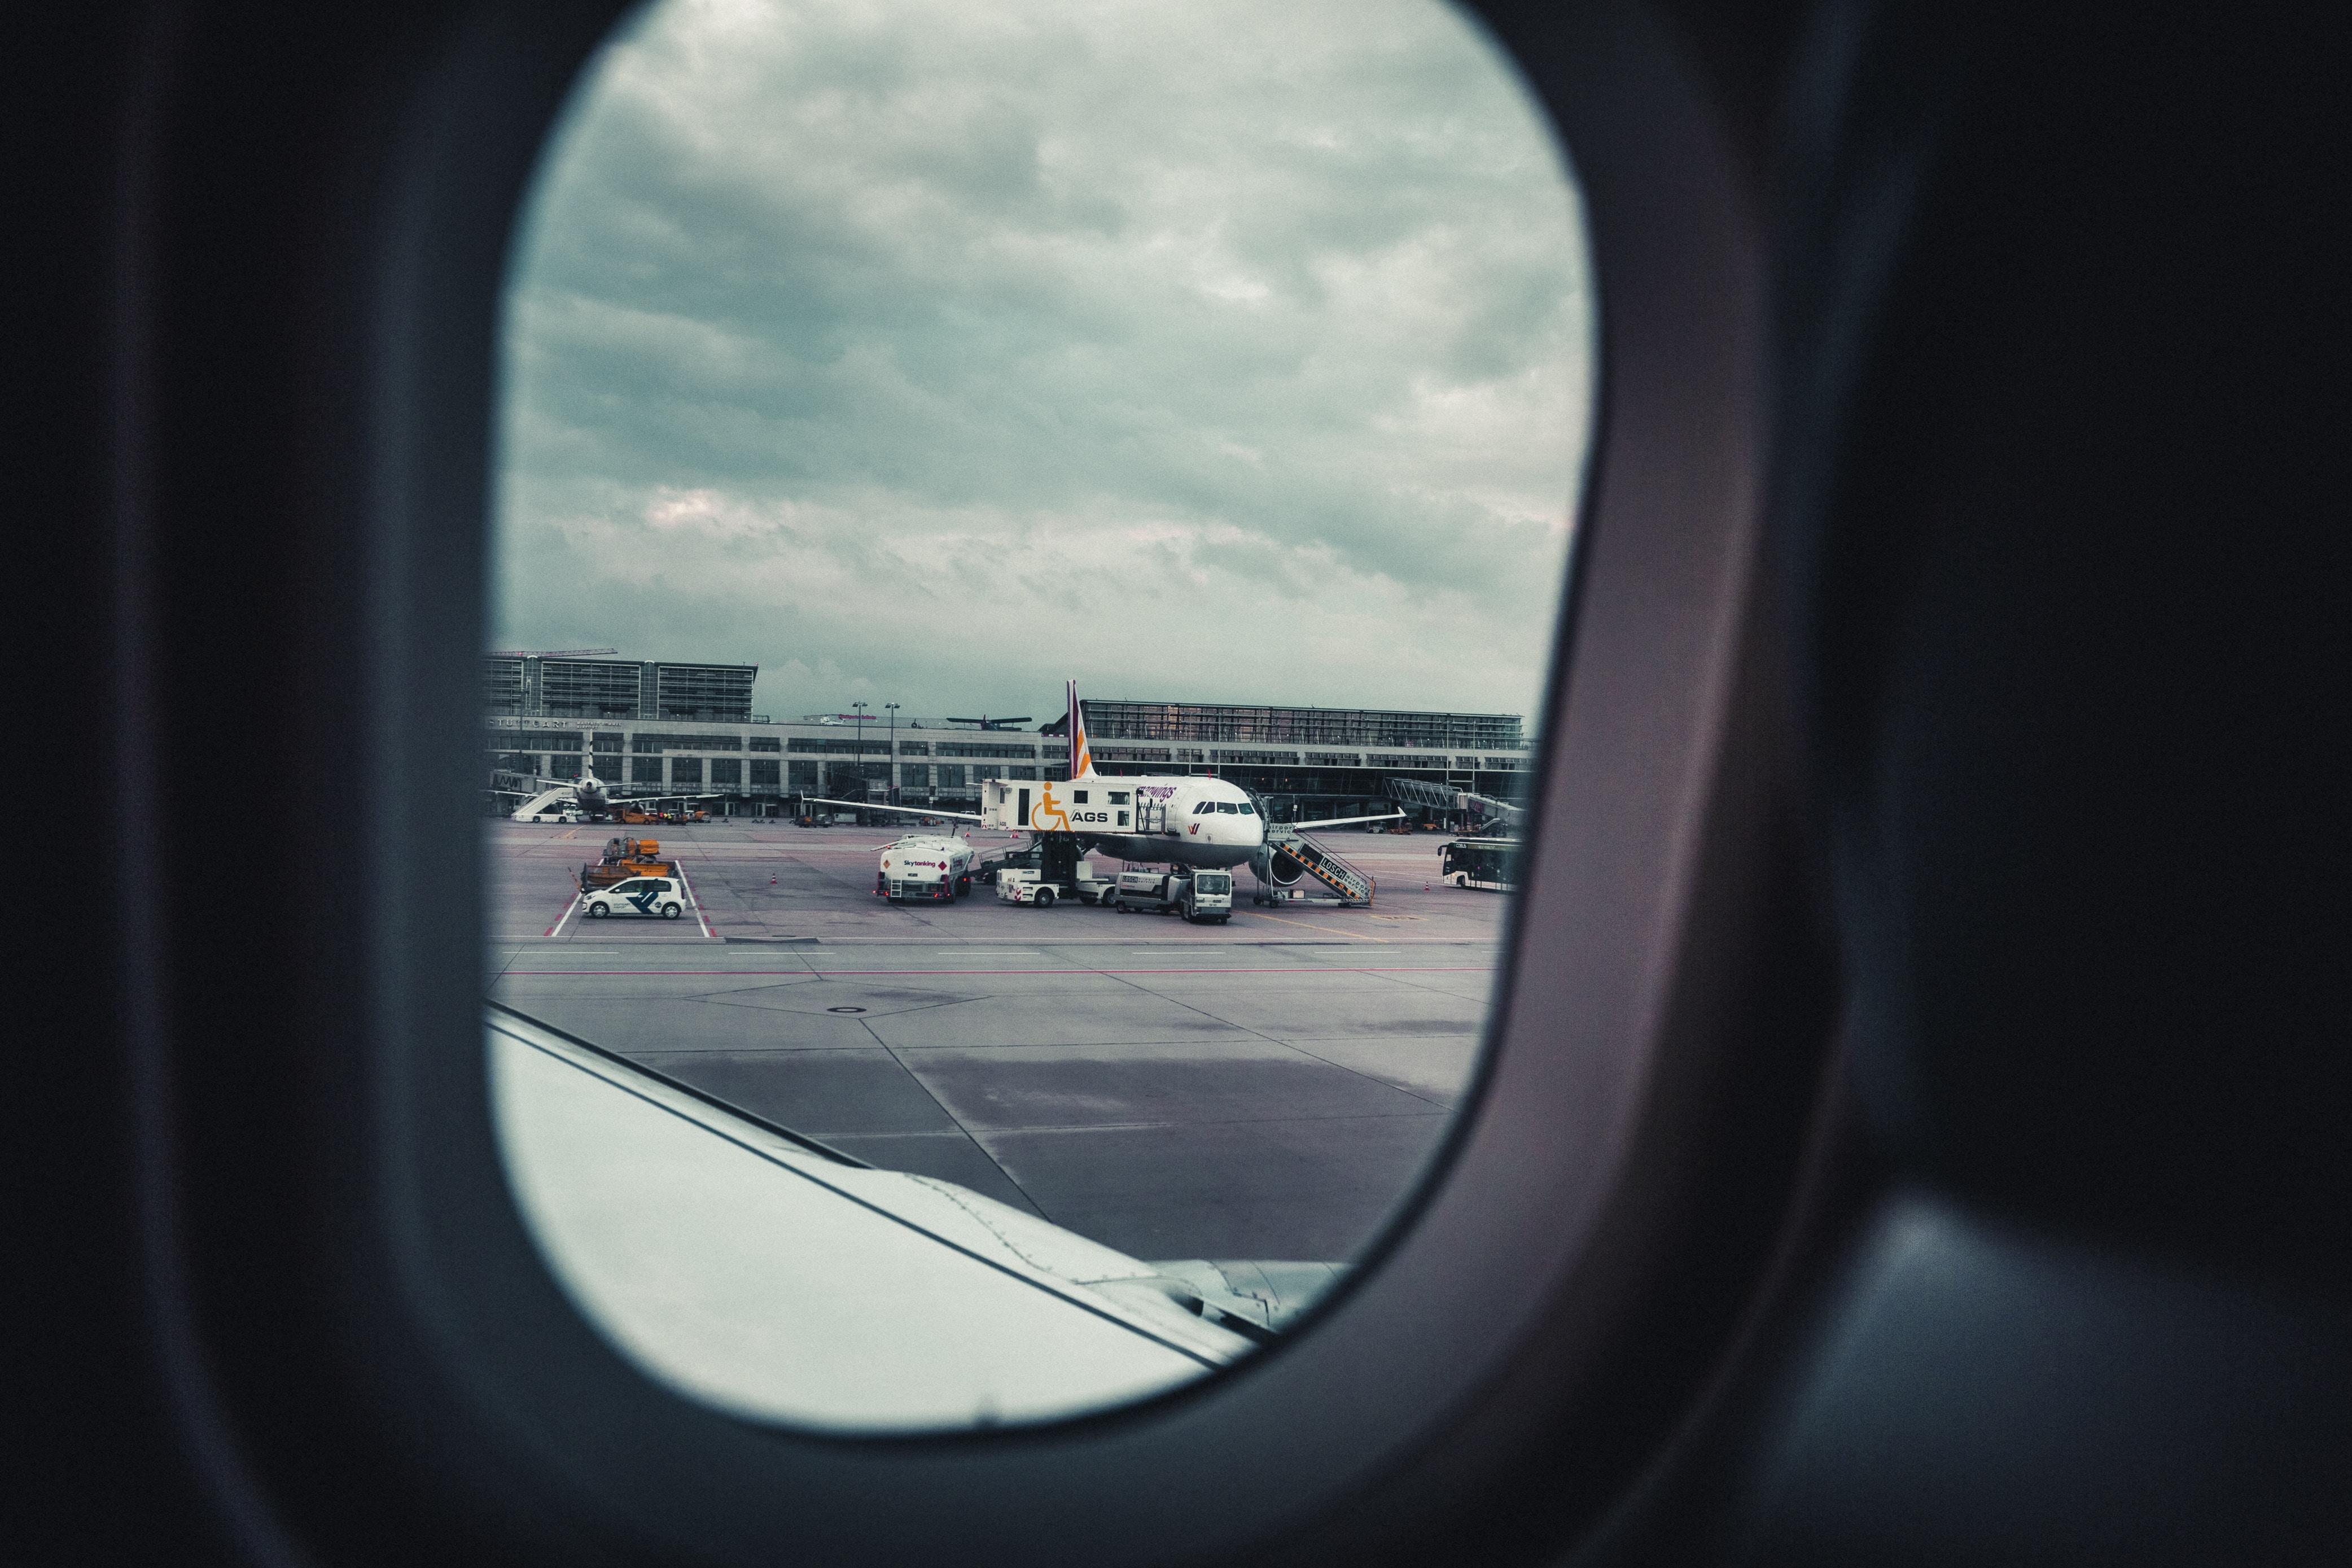 photo of white airplane